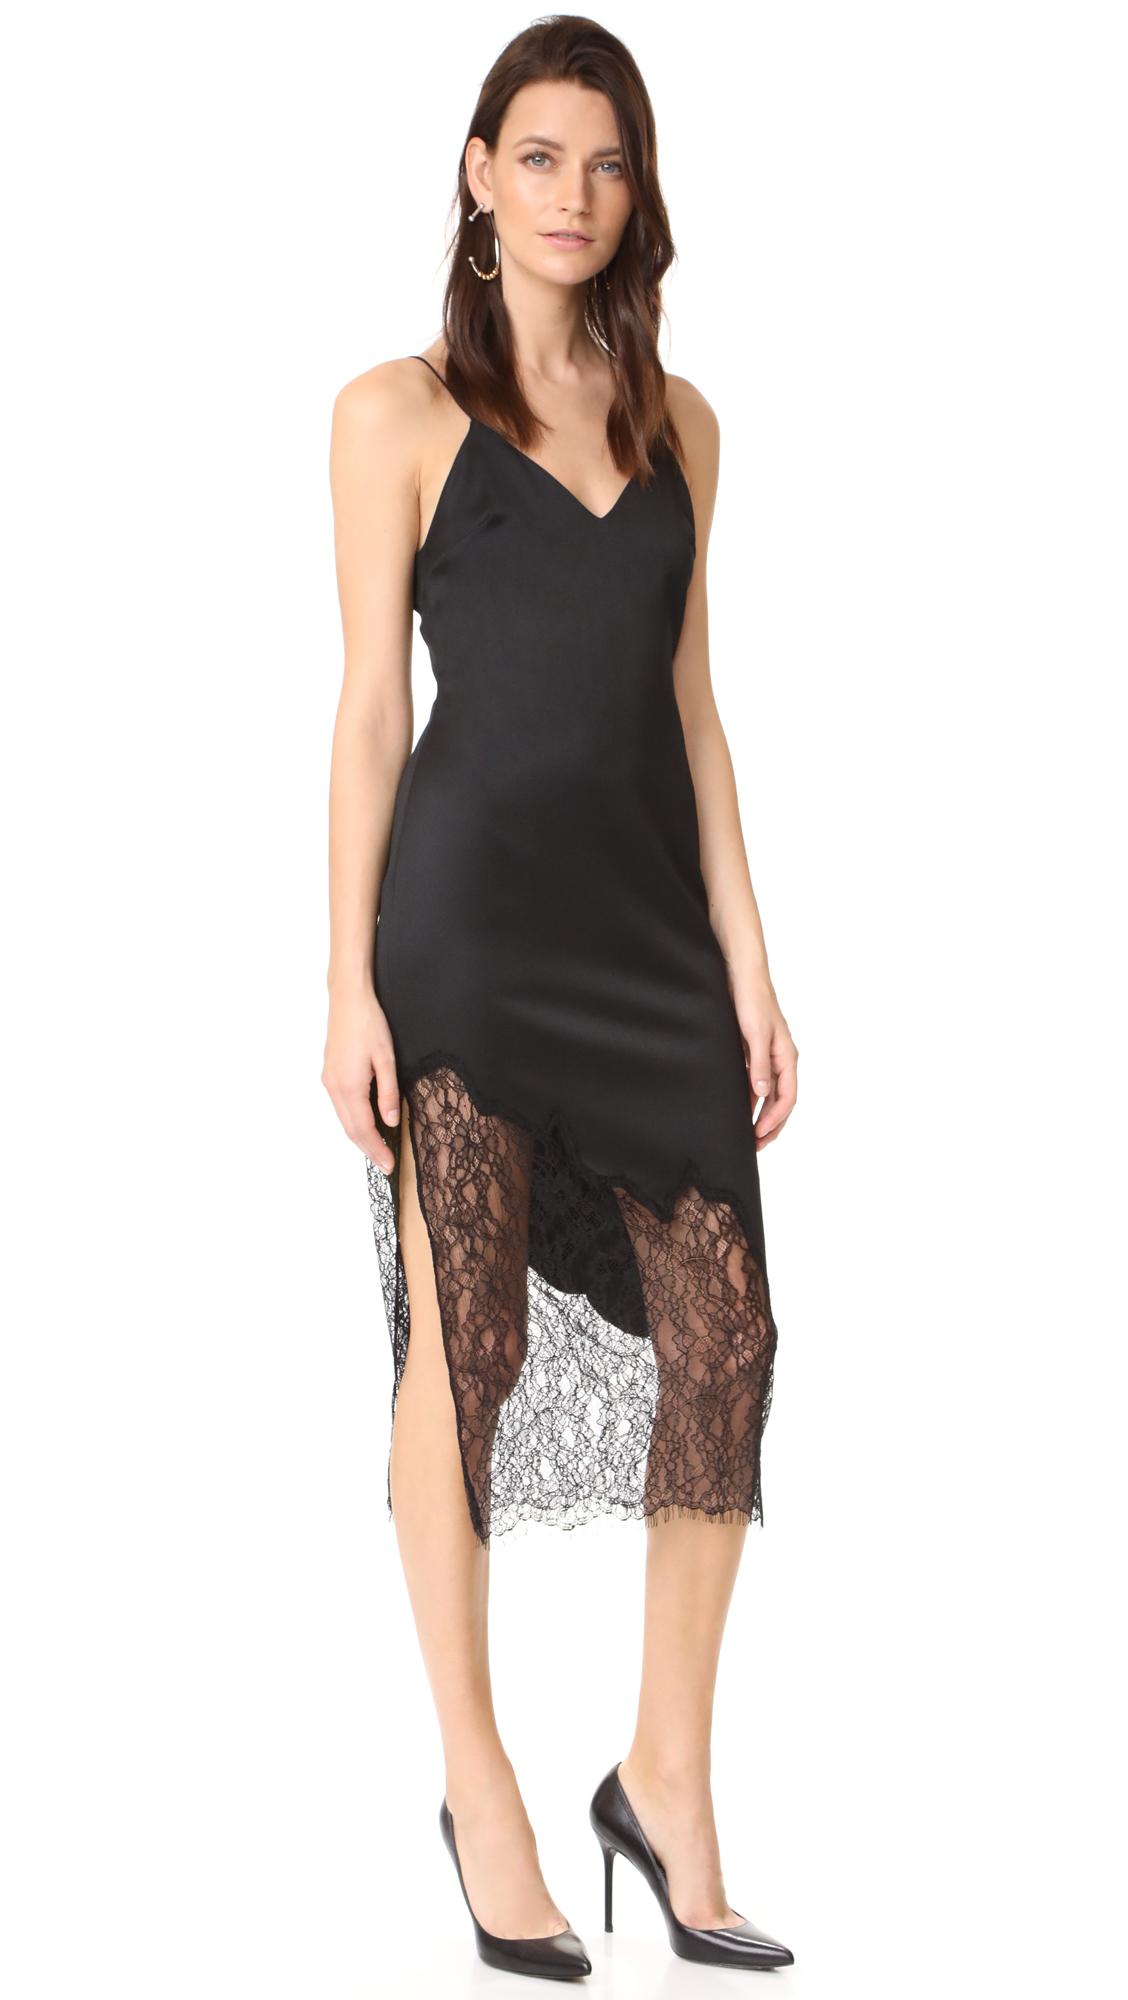 alice + olivia Evalee Side Slit Midi Slip Dress - Black